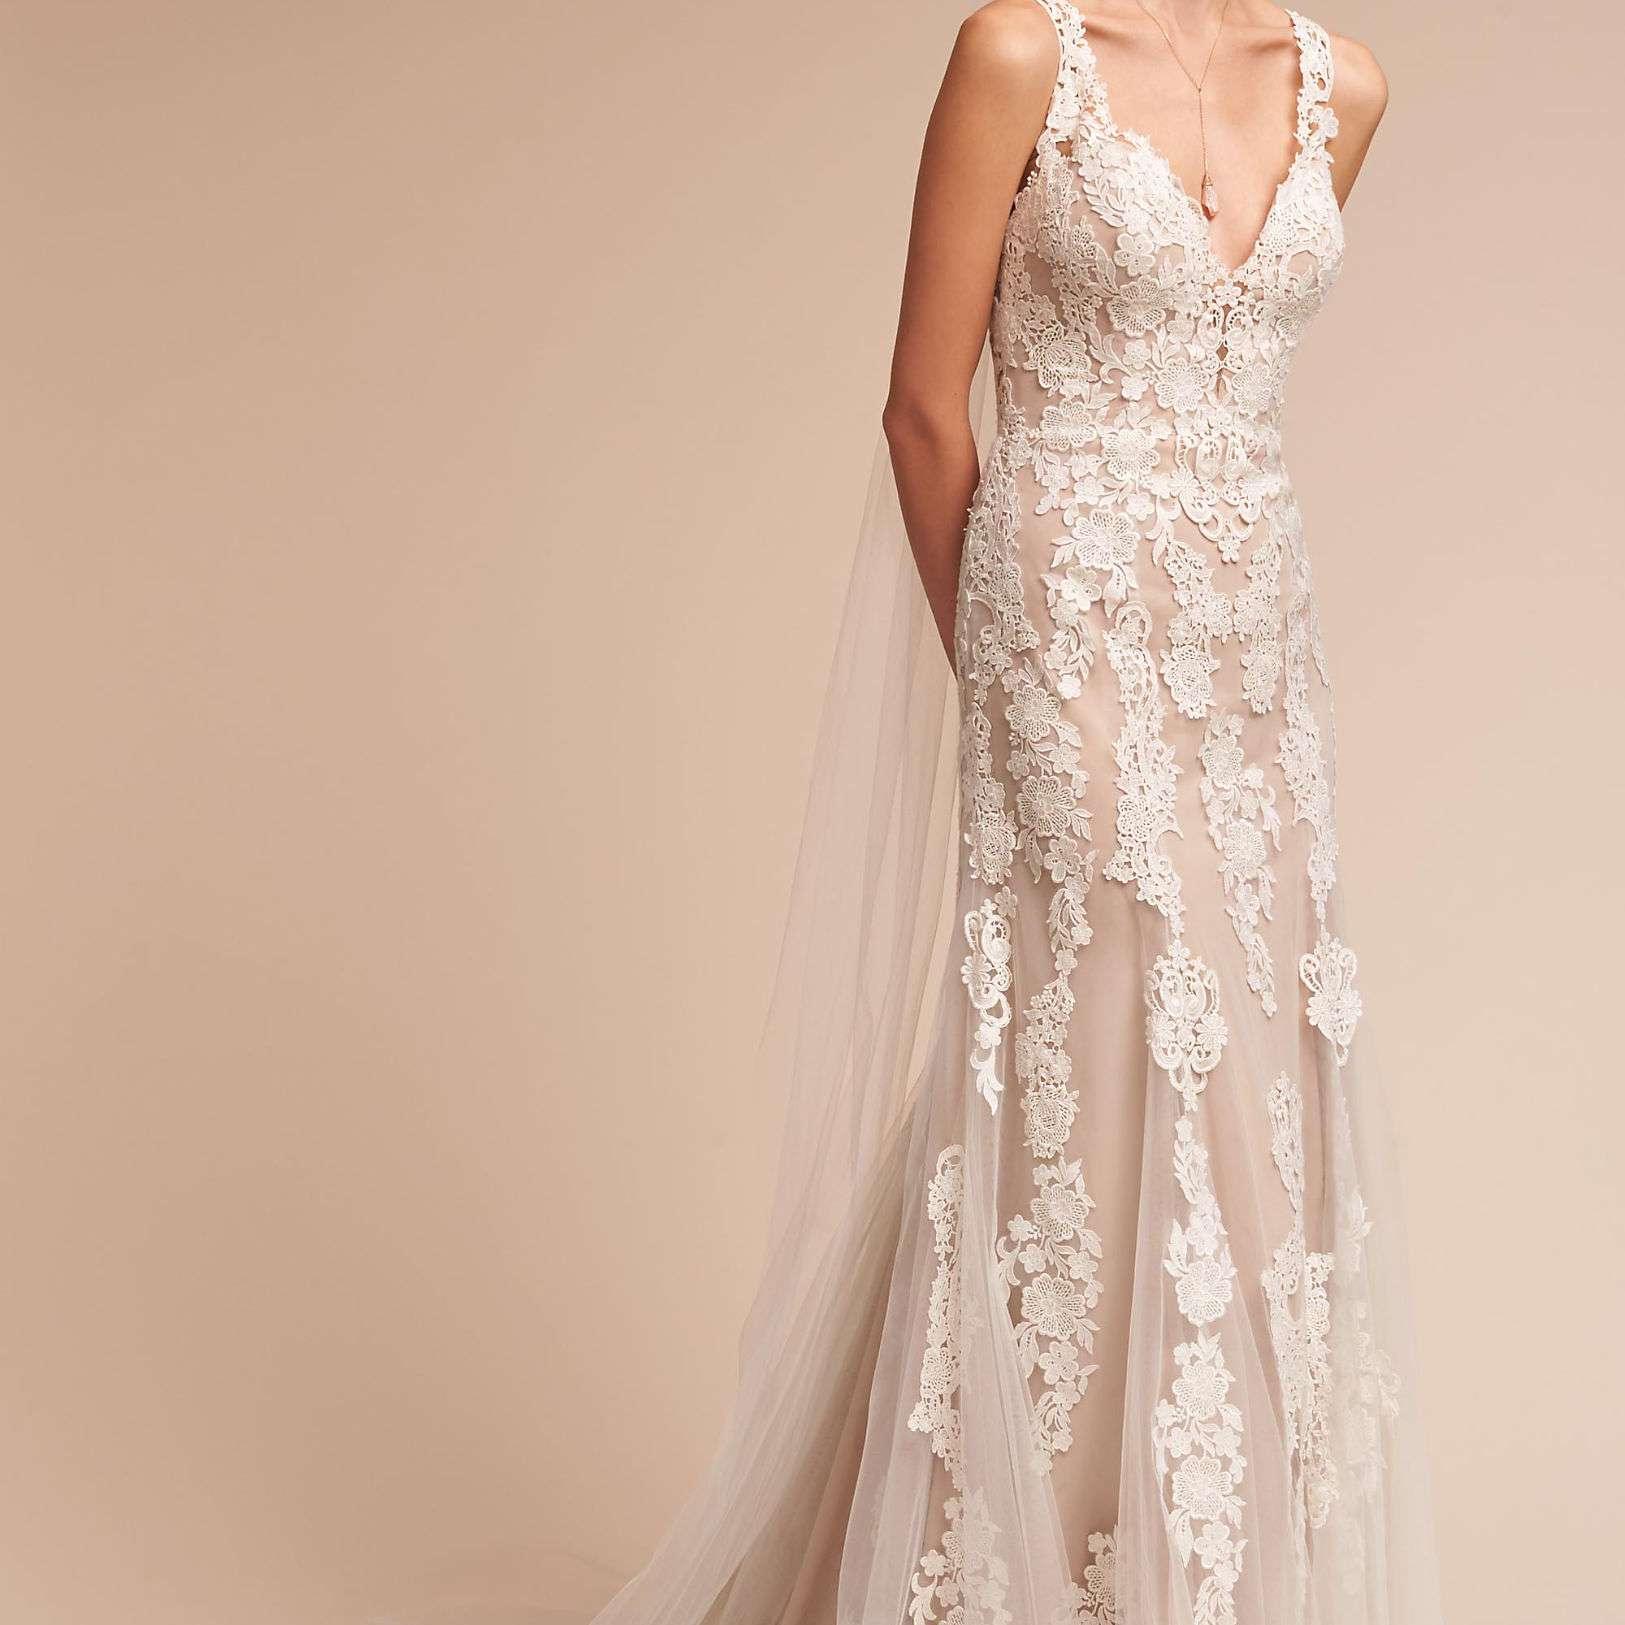 49 Beautiful Bohemian Wedding Dresses That Range From Glamorous To